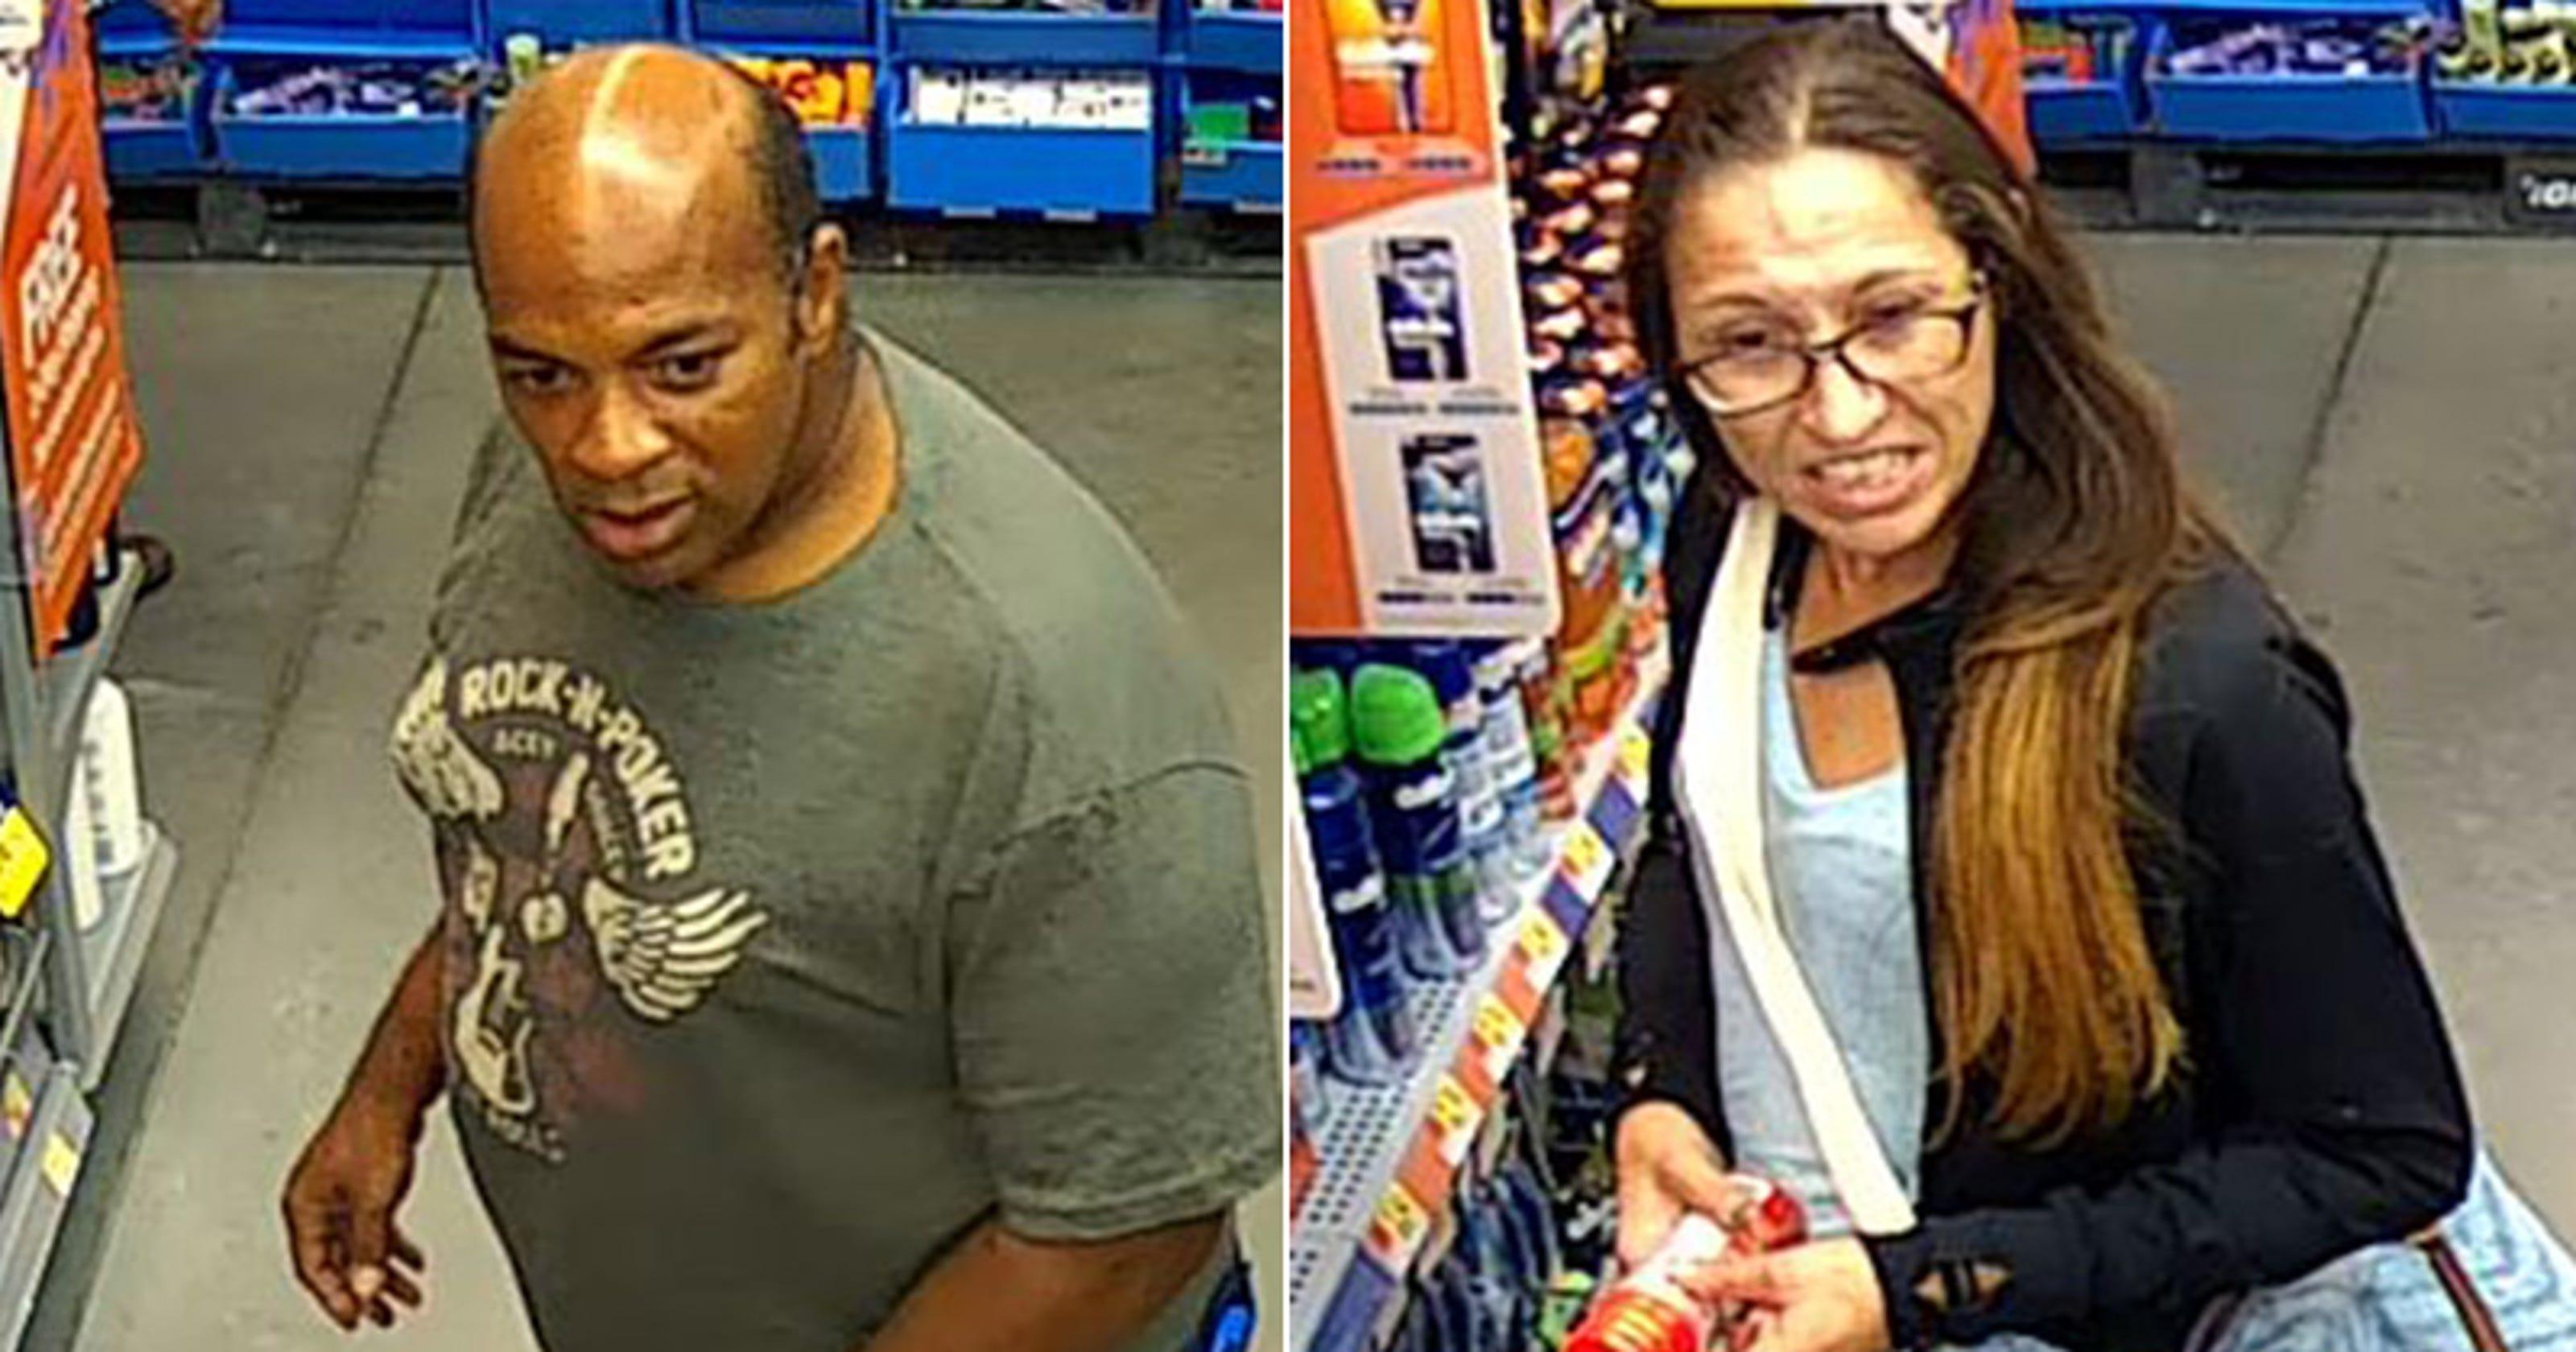 Help sought to solve Estero Walmart theft of razors worth $4,200